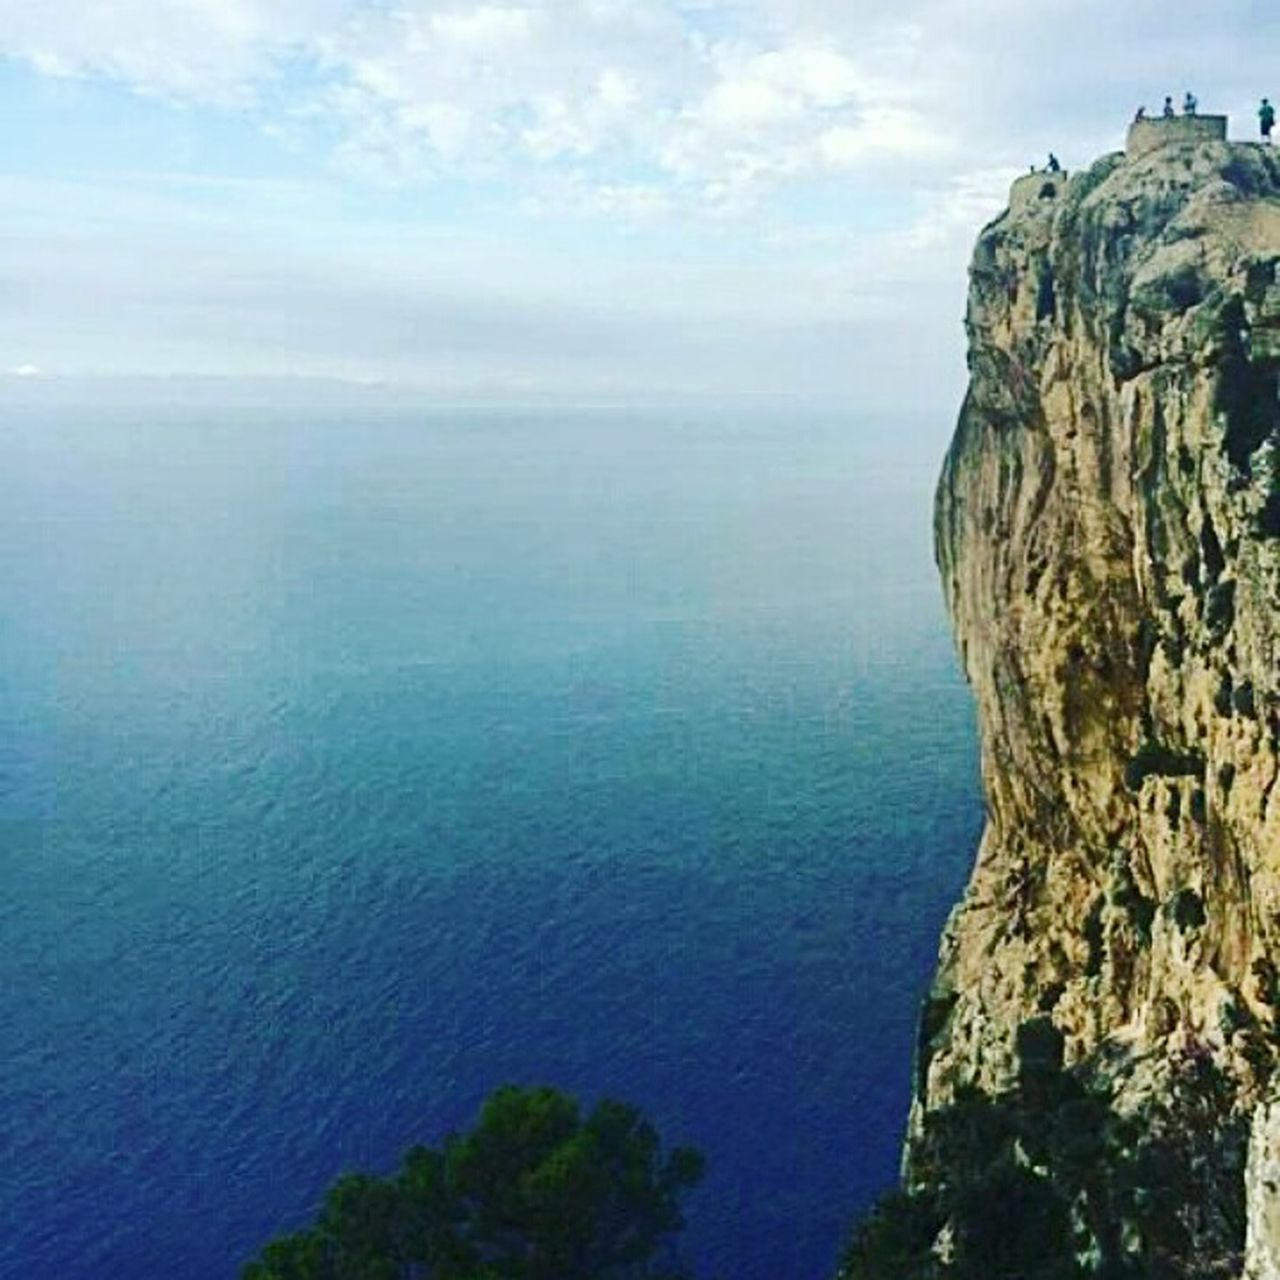 Sea Cloud Cliff Edge Cliffside Cliffs And Sea Capdeformentor Mallorca Explore Tourist Attraction  High Rock - Object Watchtower Rock Face Trees Vantagepoint Viewpoint Breathtaking Scary Vertigo